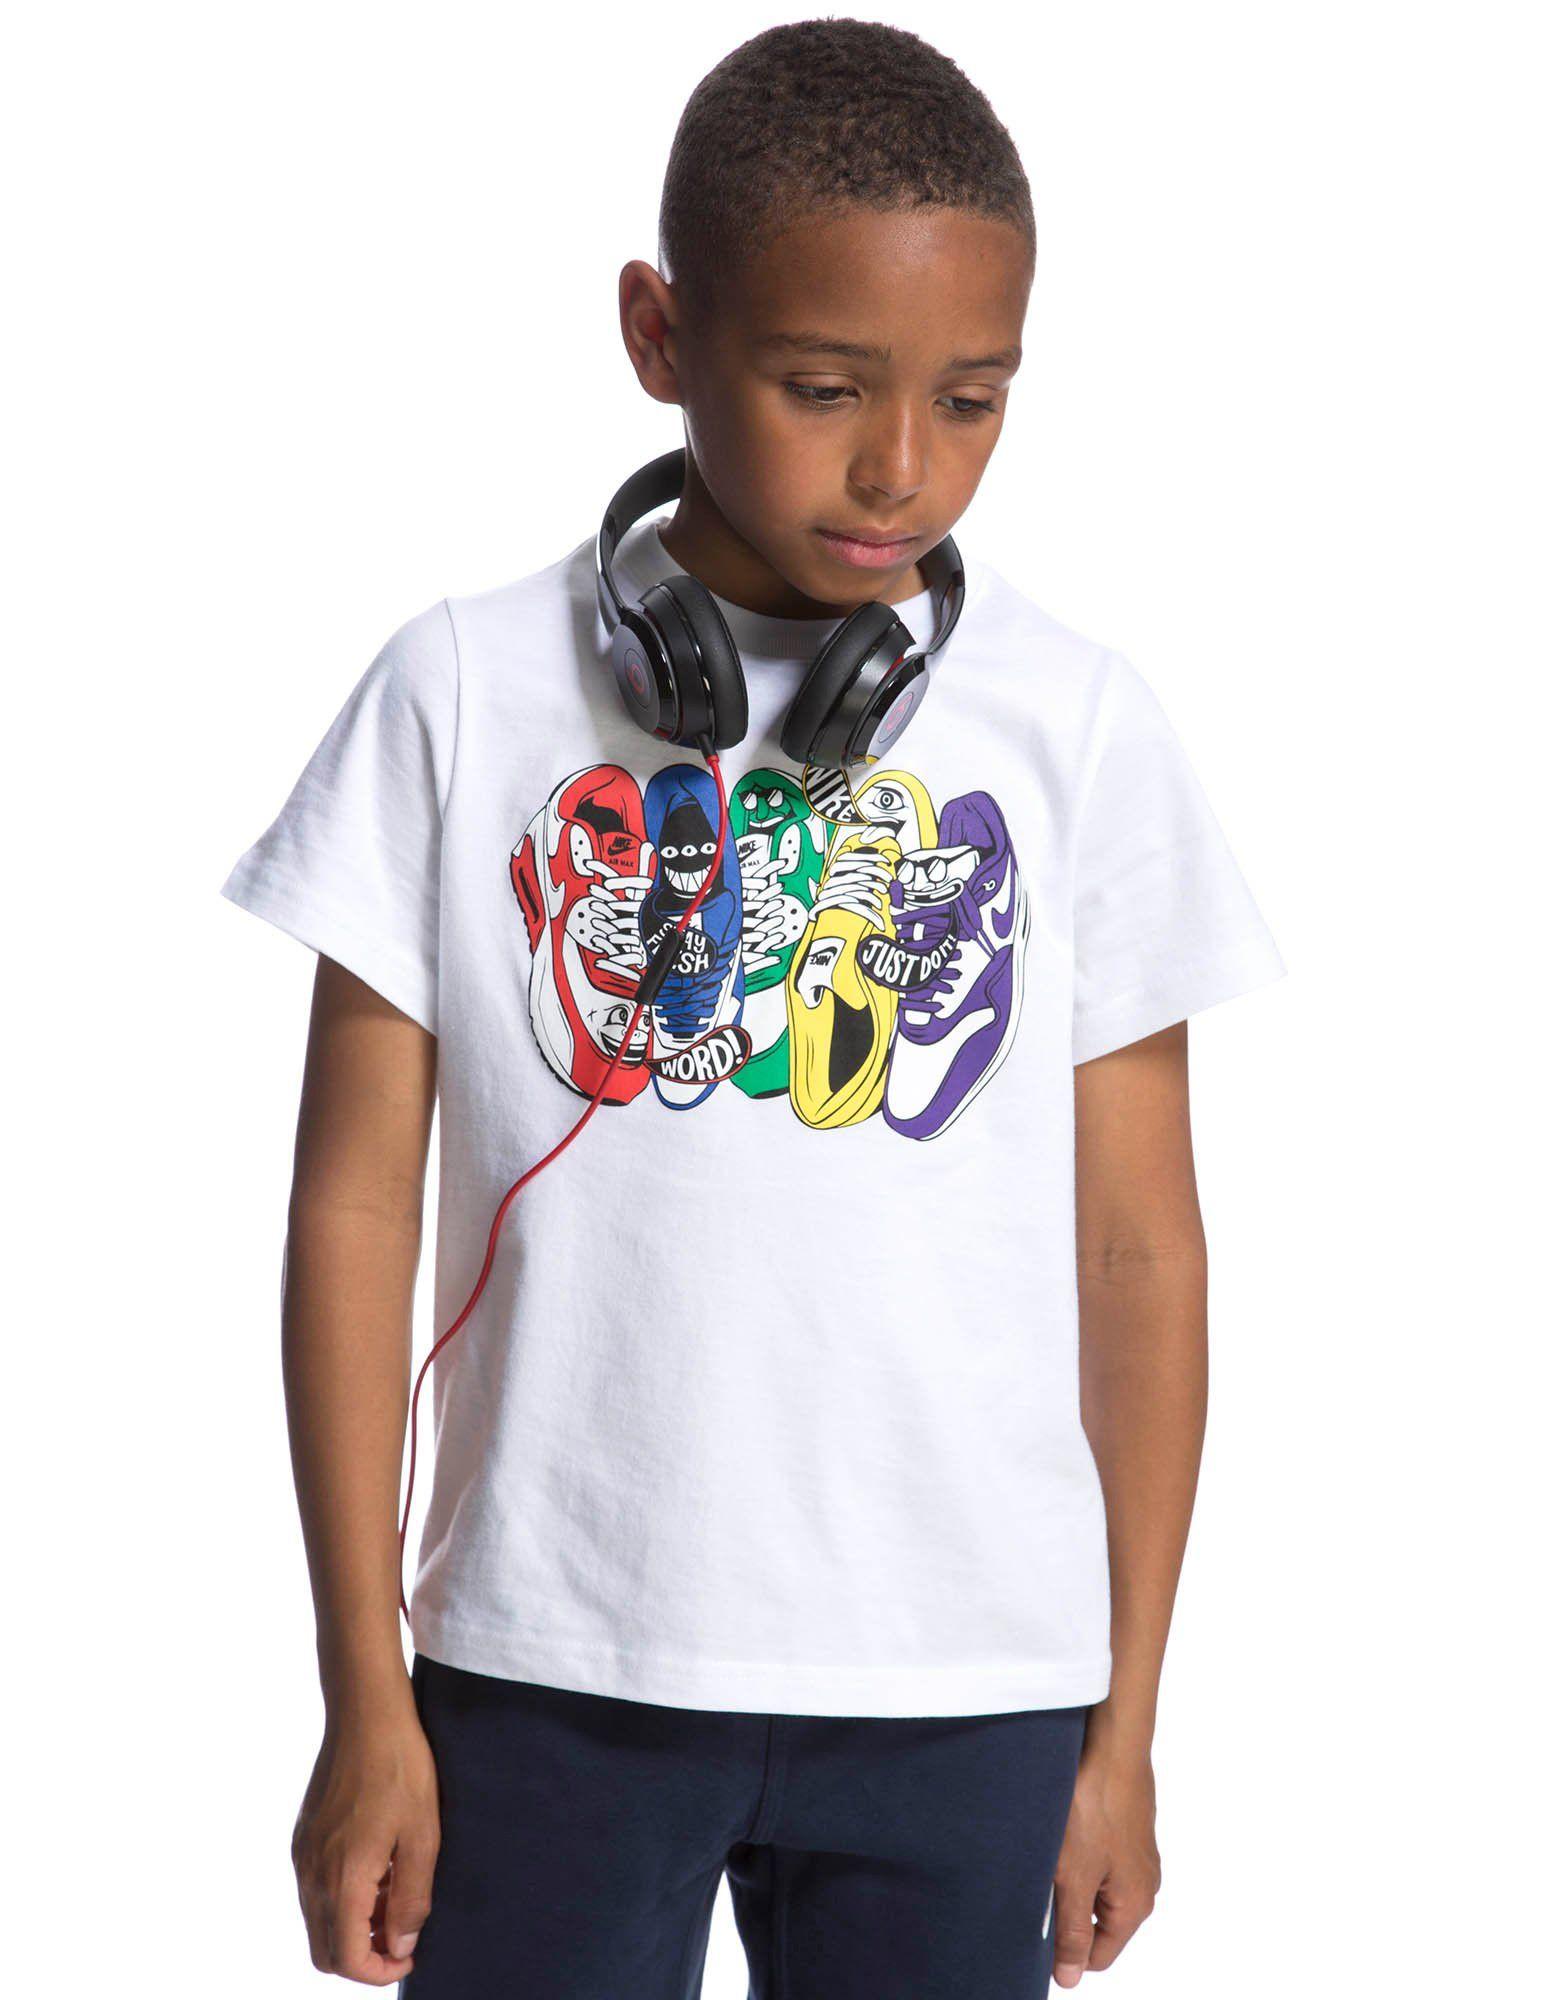 Nike Talking Fresh T-Shirt Junior